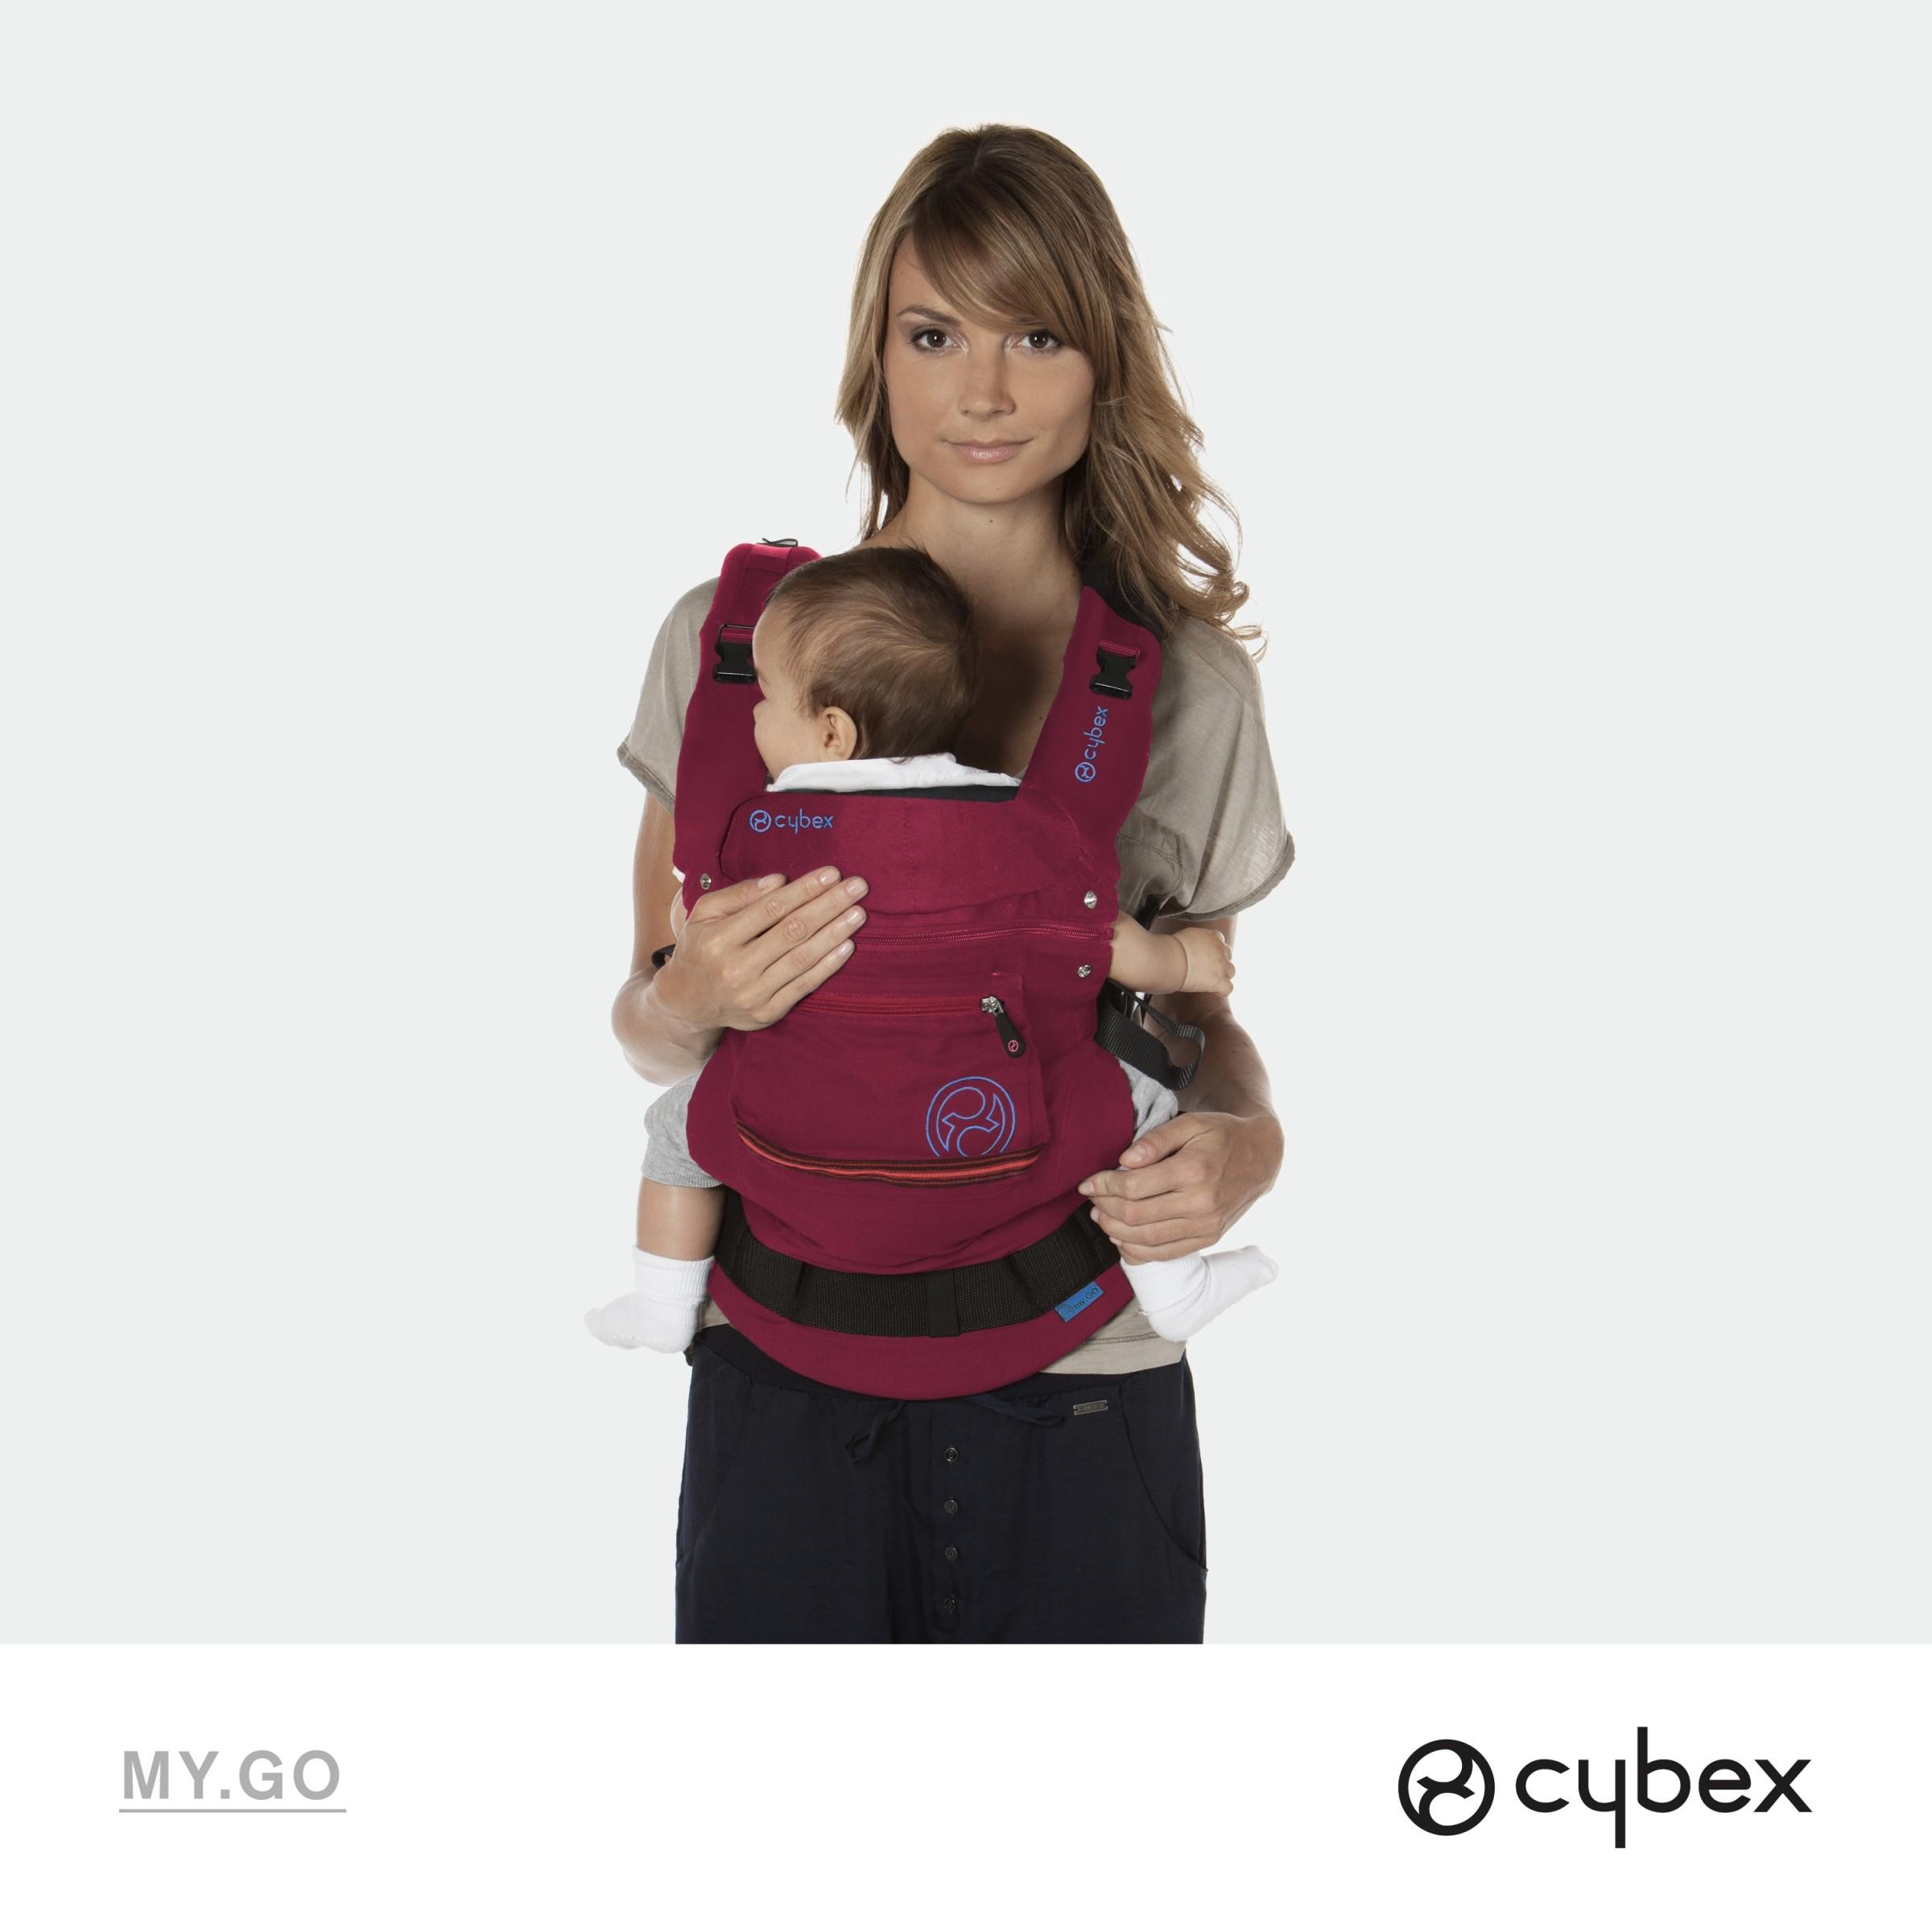 Cybex MY.GO Babytrage assorted